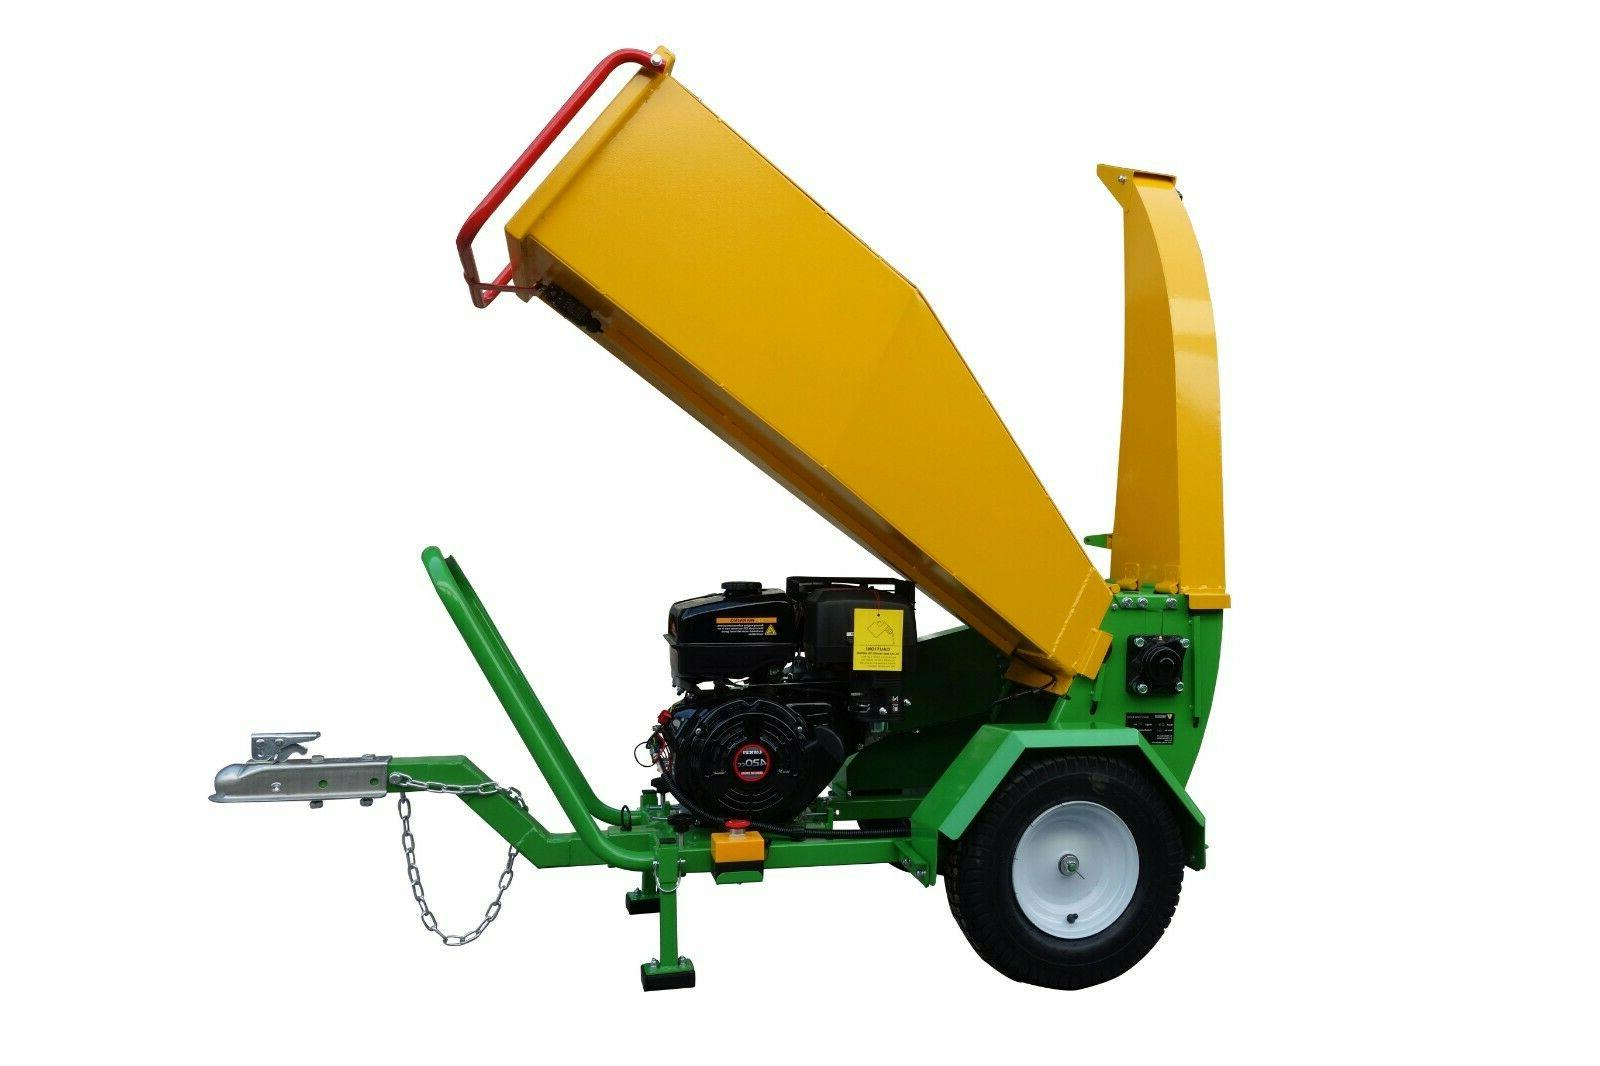 wood chipper shredder mulcher gts1500 driven by